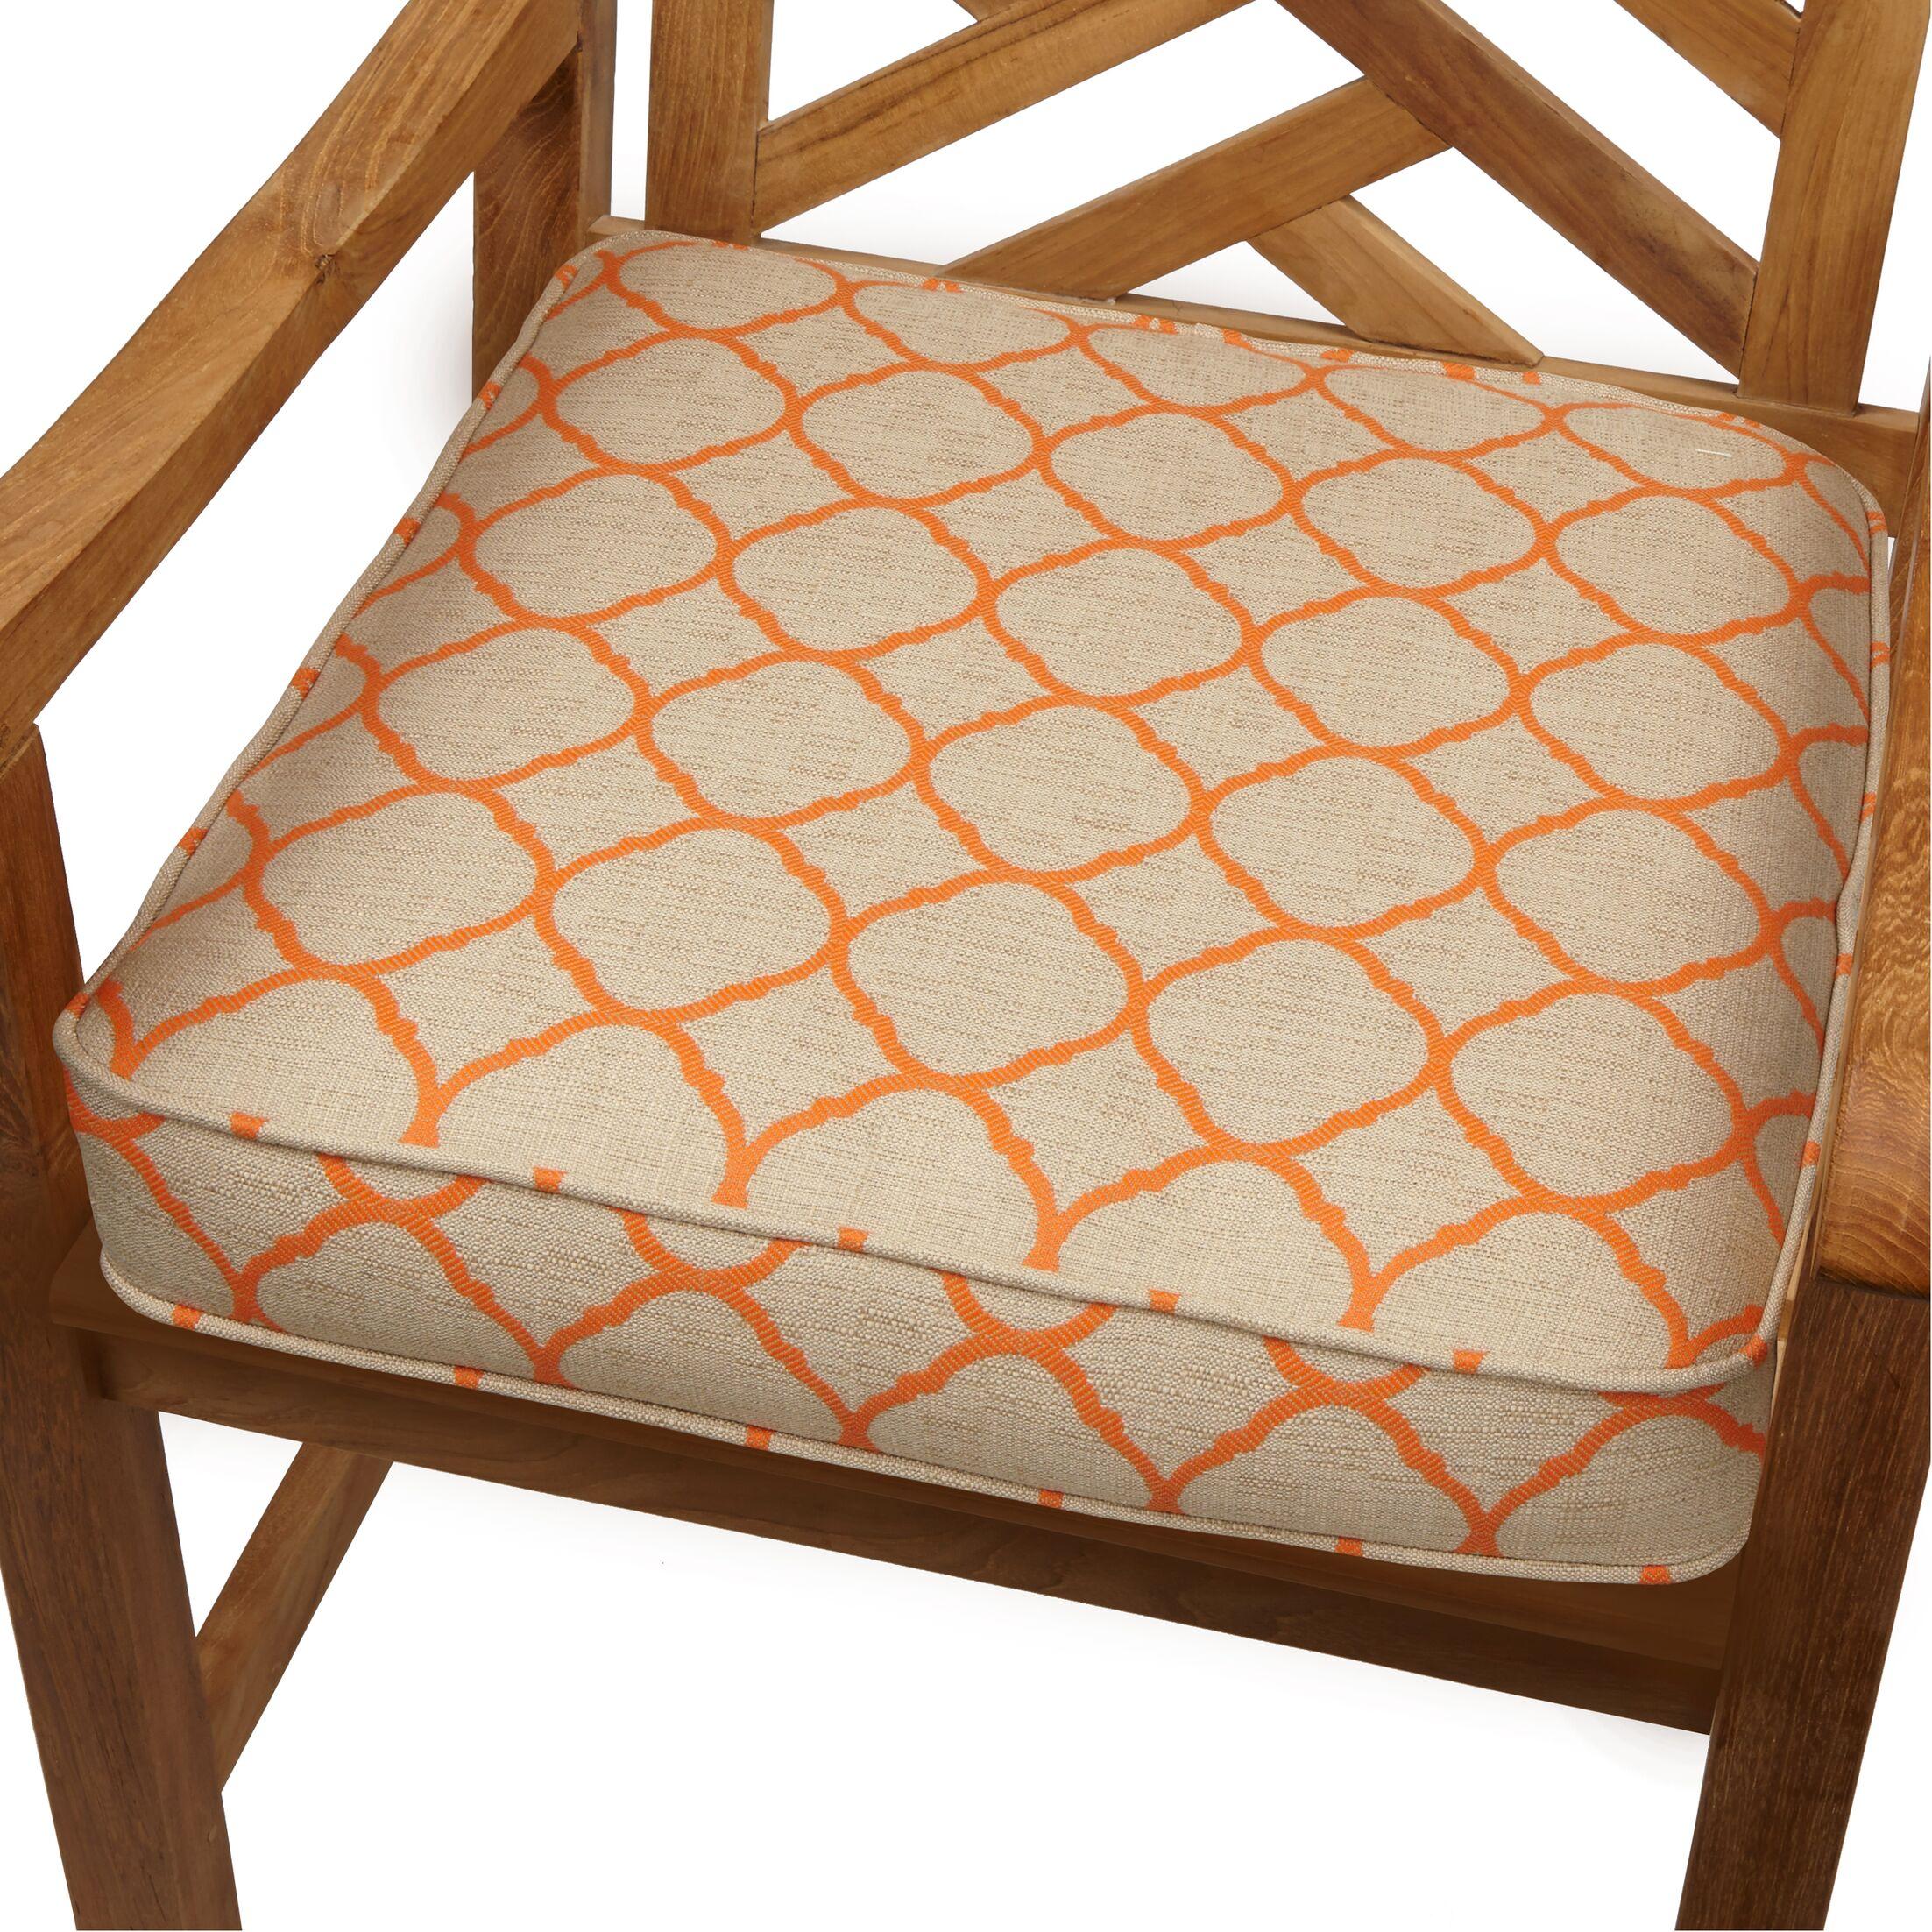 Indoor/Outdoor Sunbrella Dining Chair Cushion Size: 20